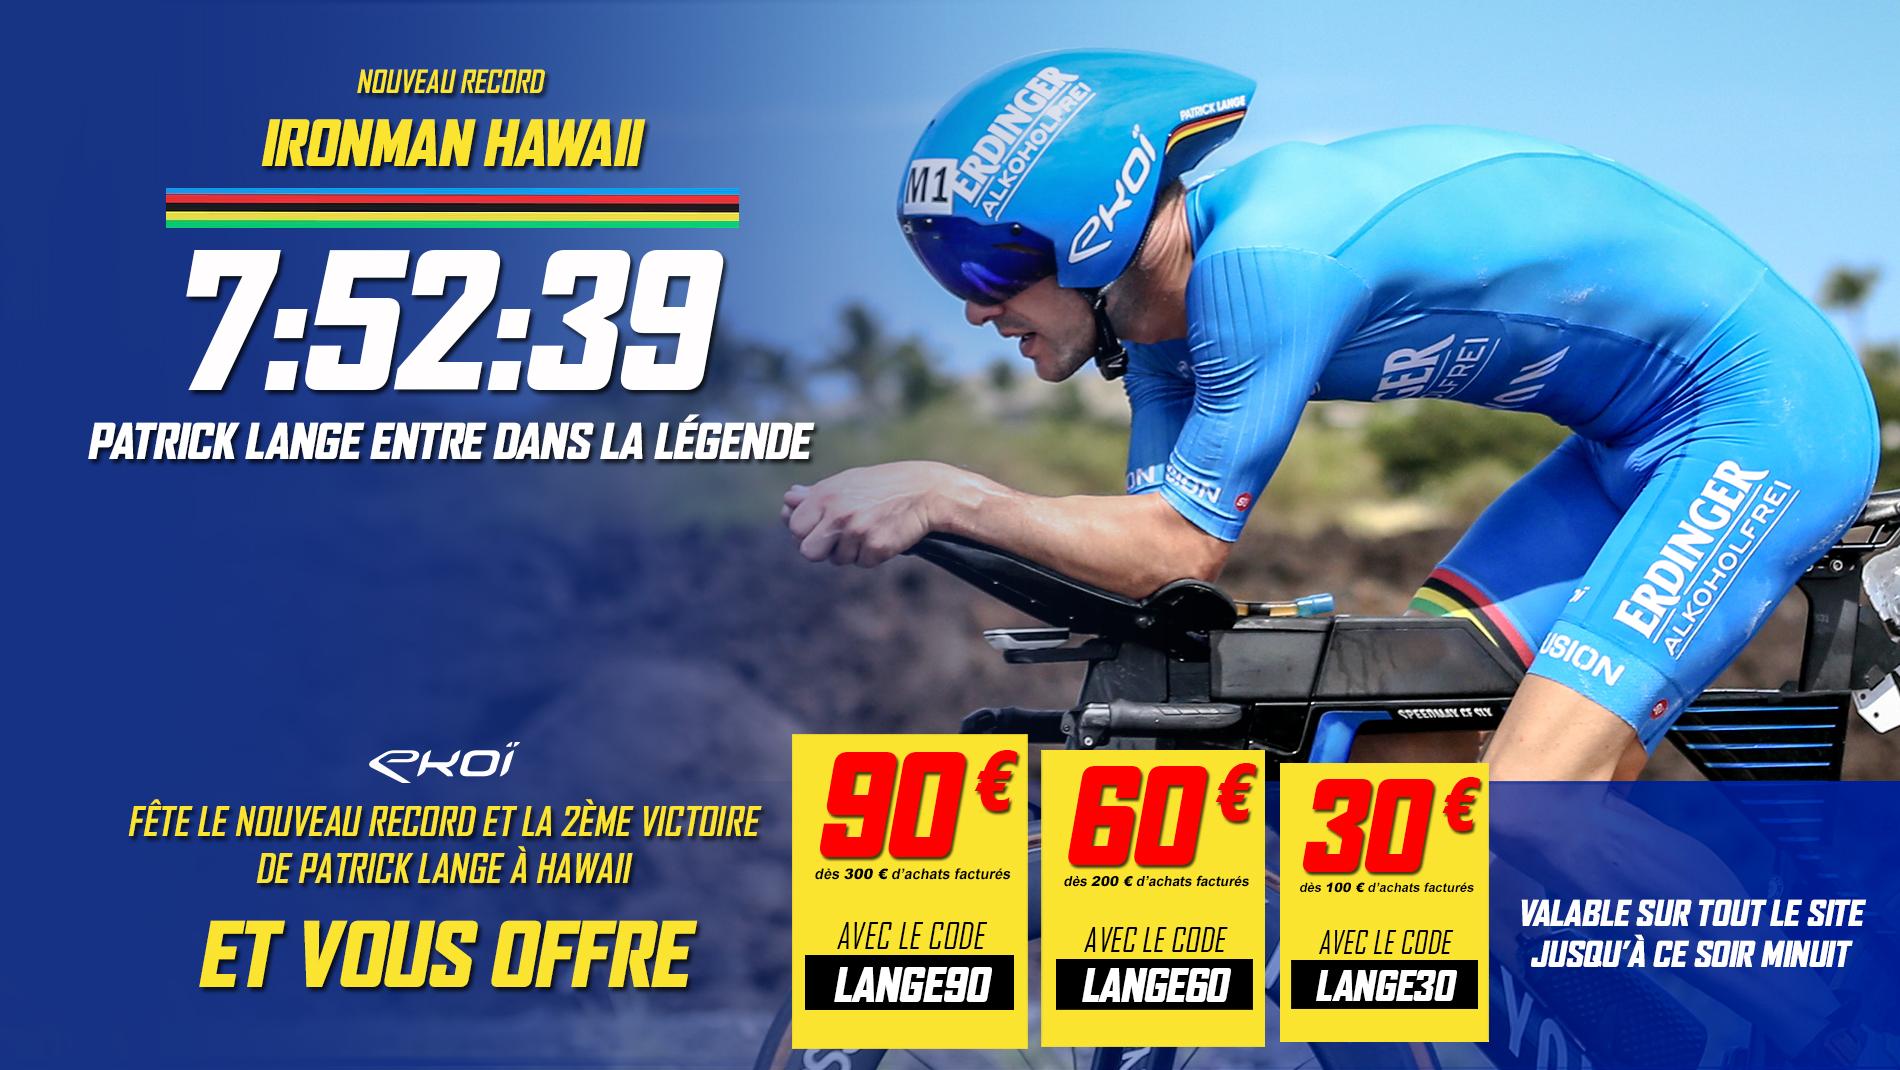 Patrick Lange nouveau record IronMan Hawai